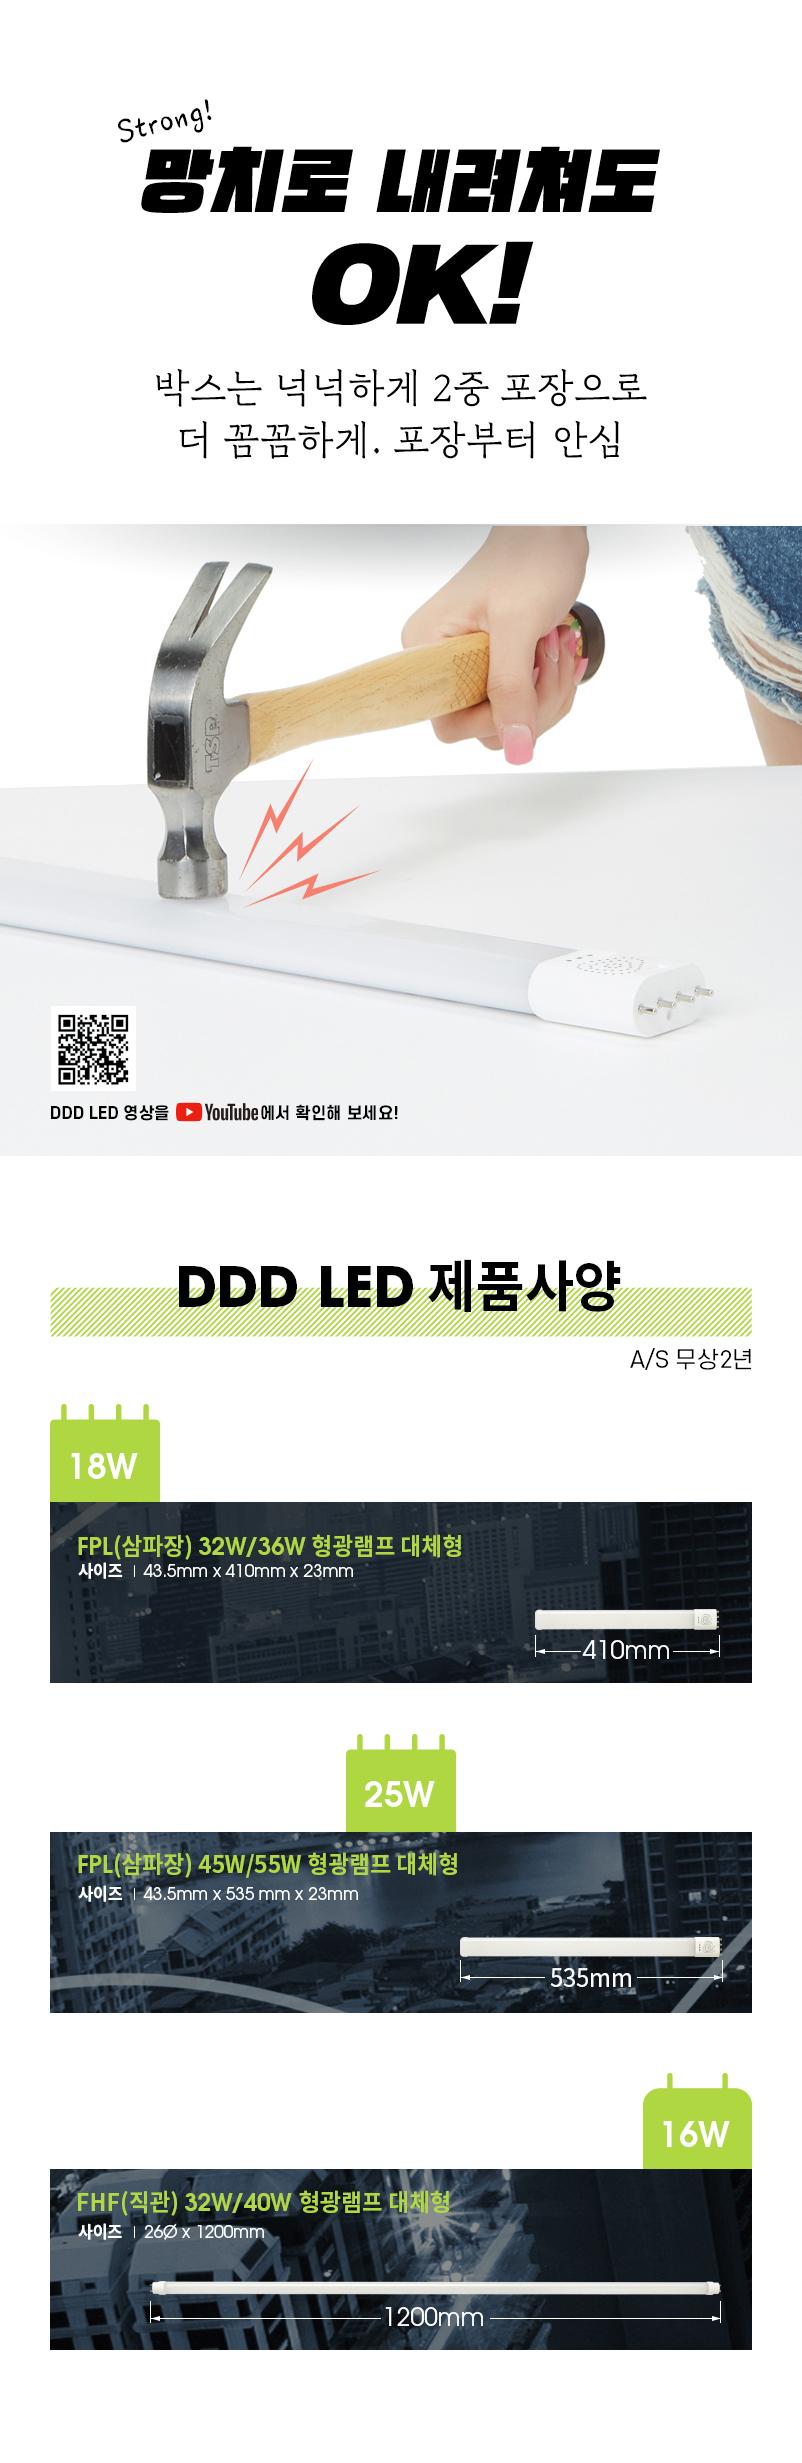 DDD상세페이지수정_2_7_05.jpg